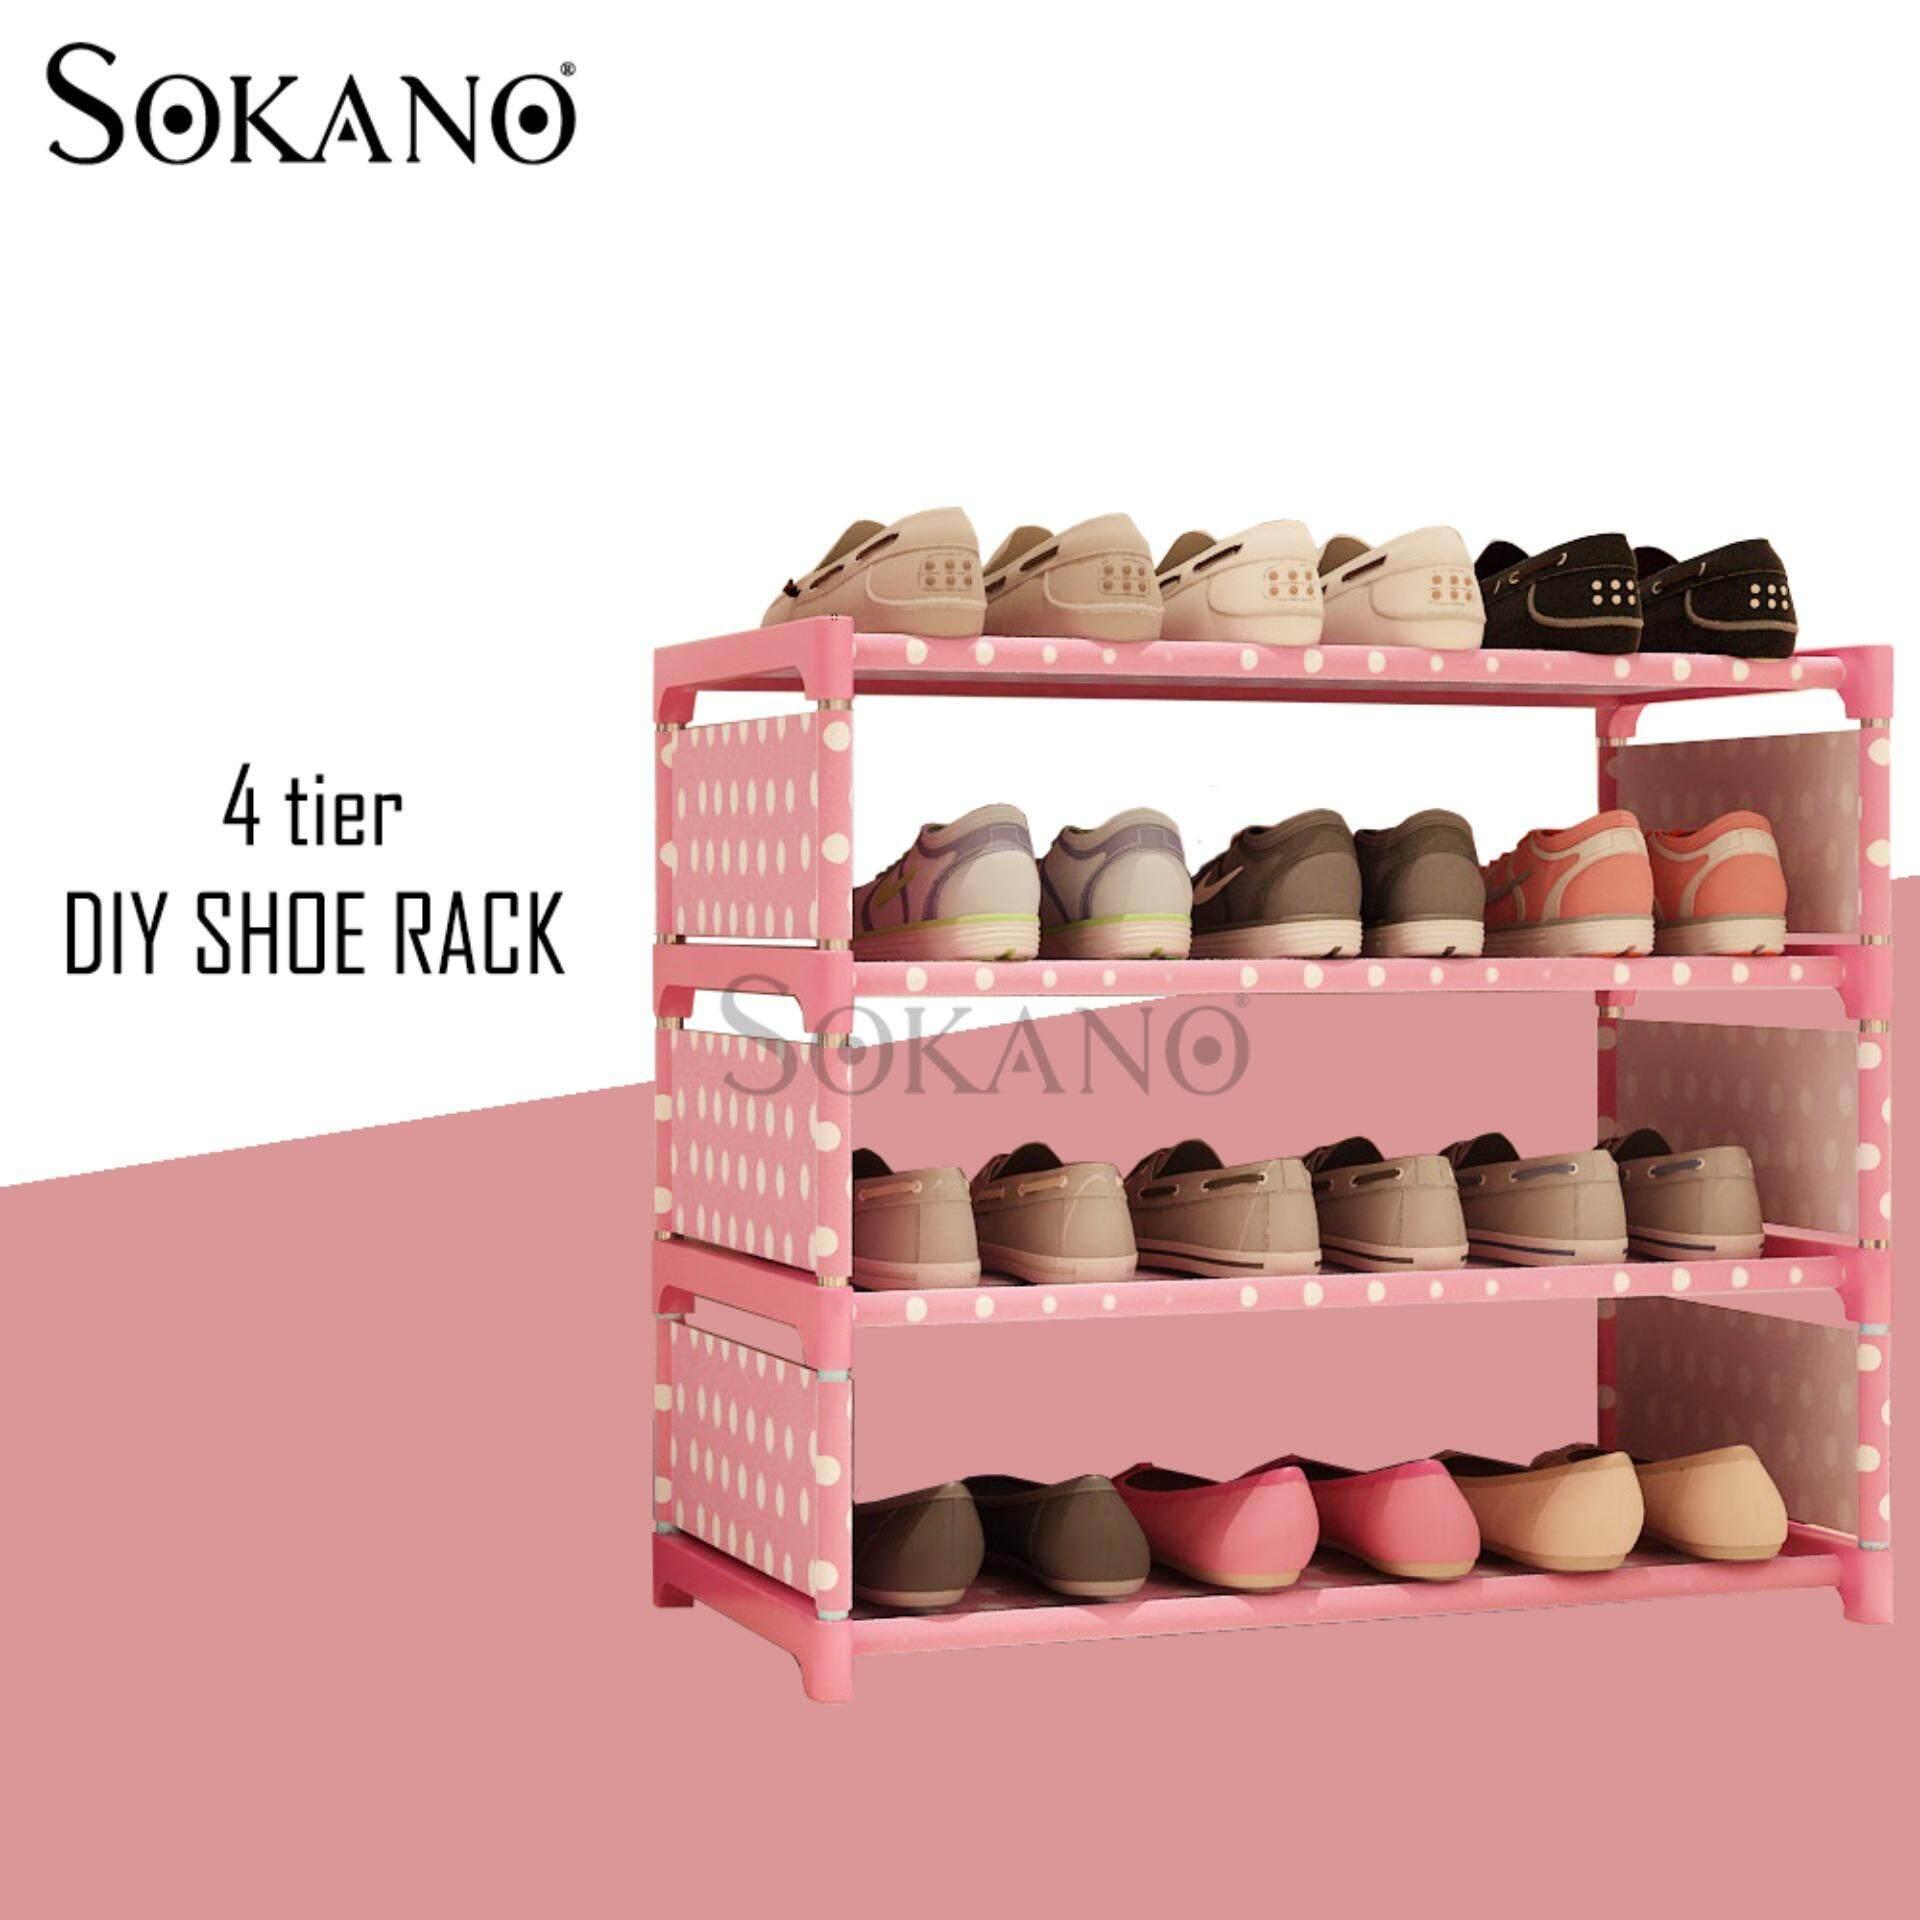 SOKANO Korean Premium Quality 4 Tier SK-4 DIY Shoe Rack - Pink Dot